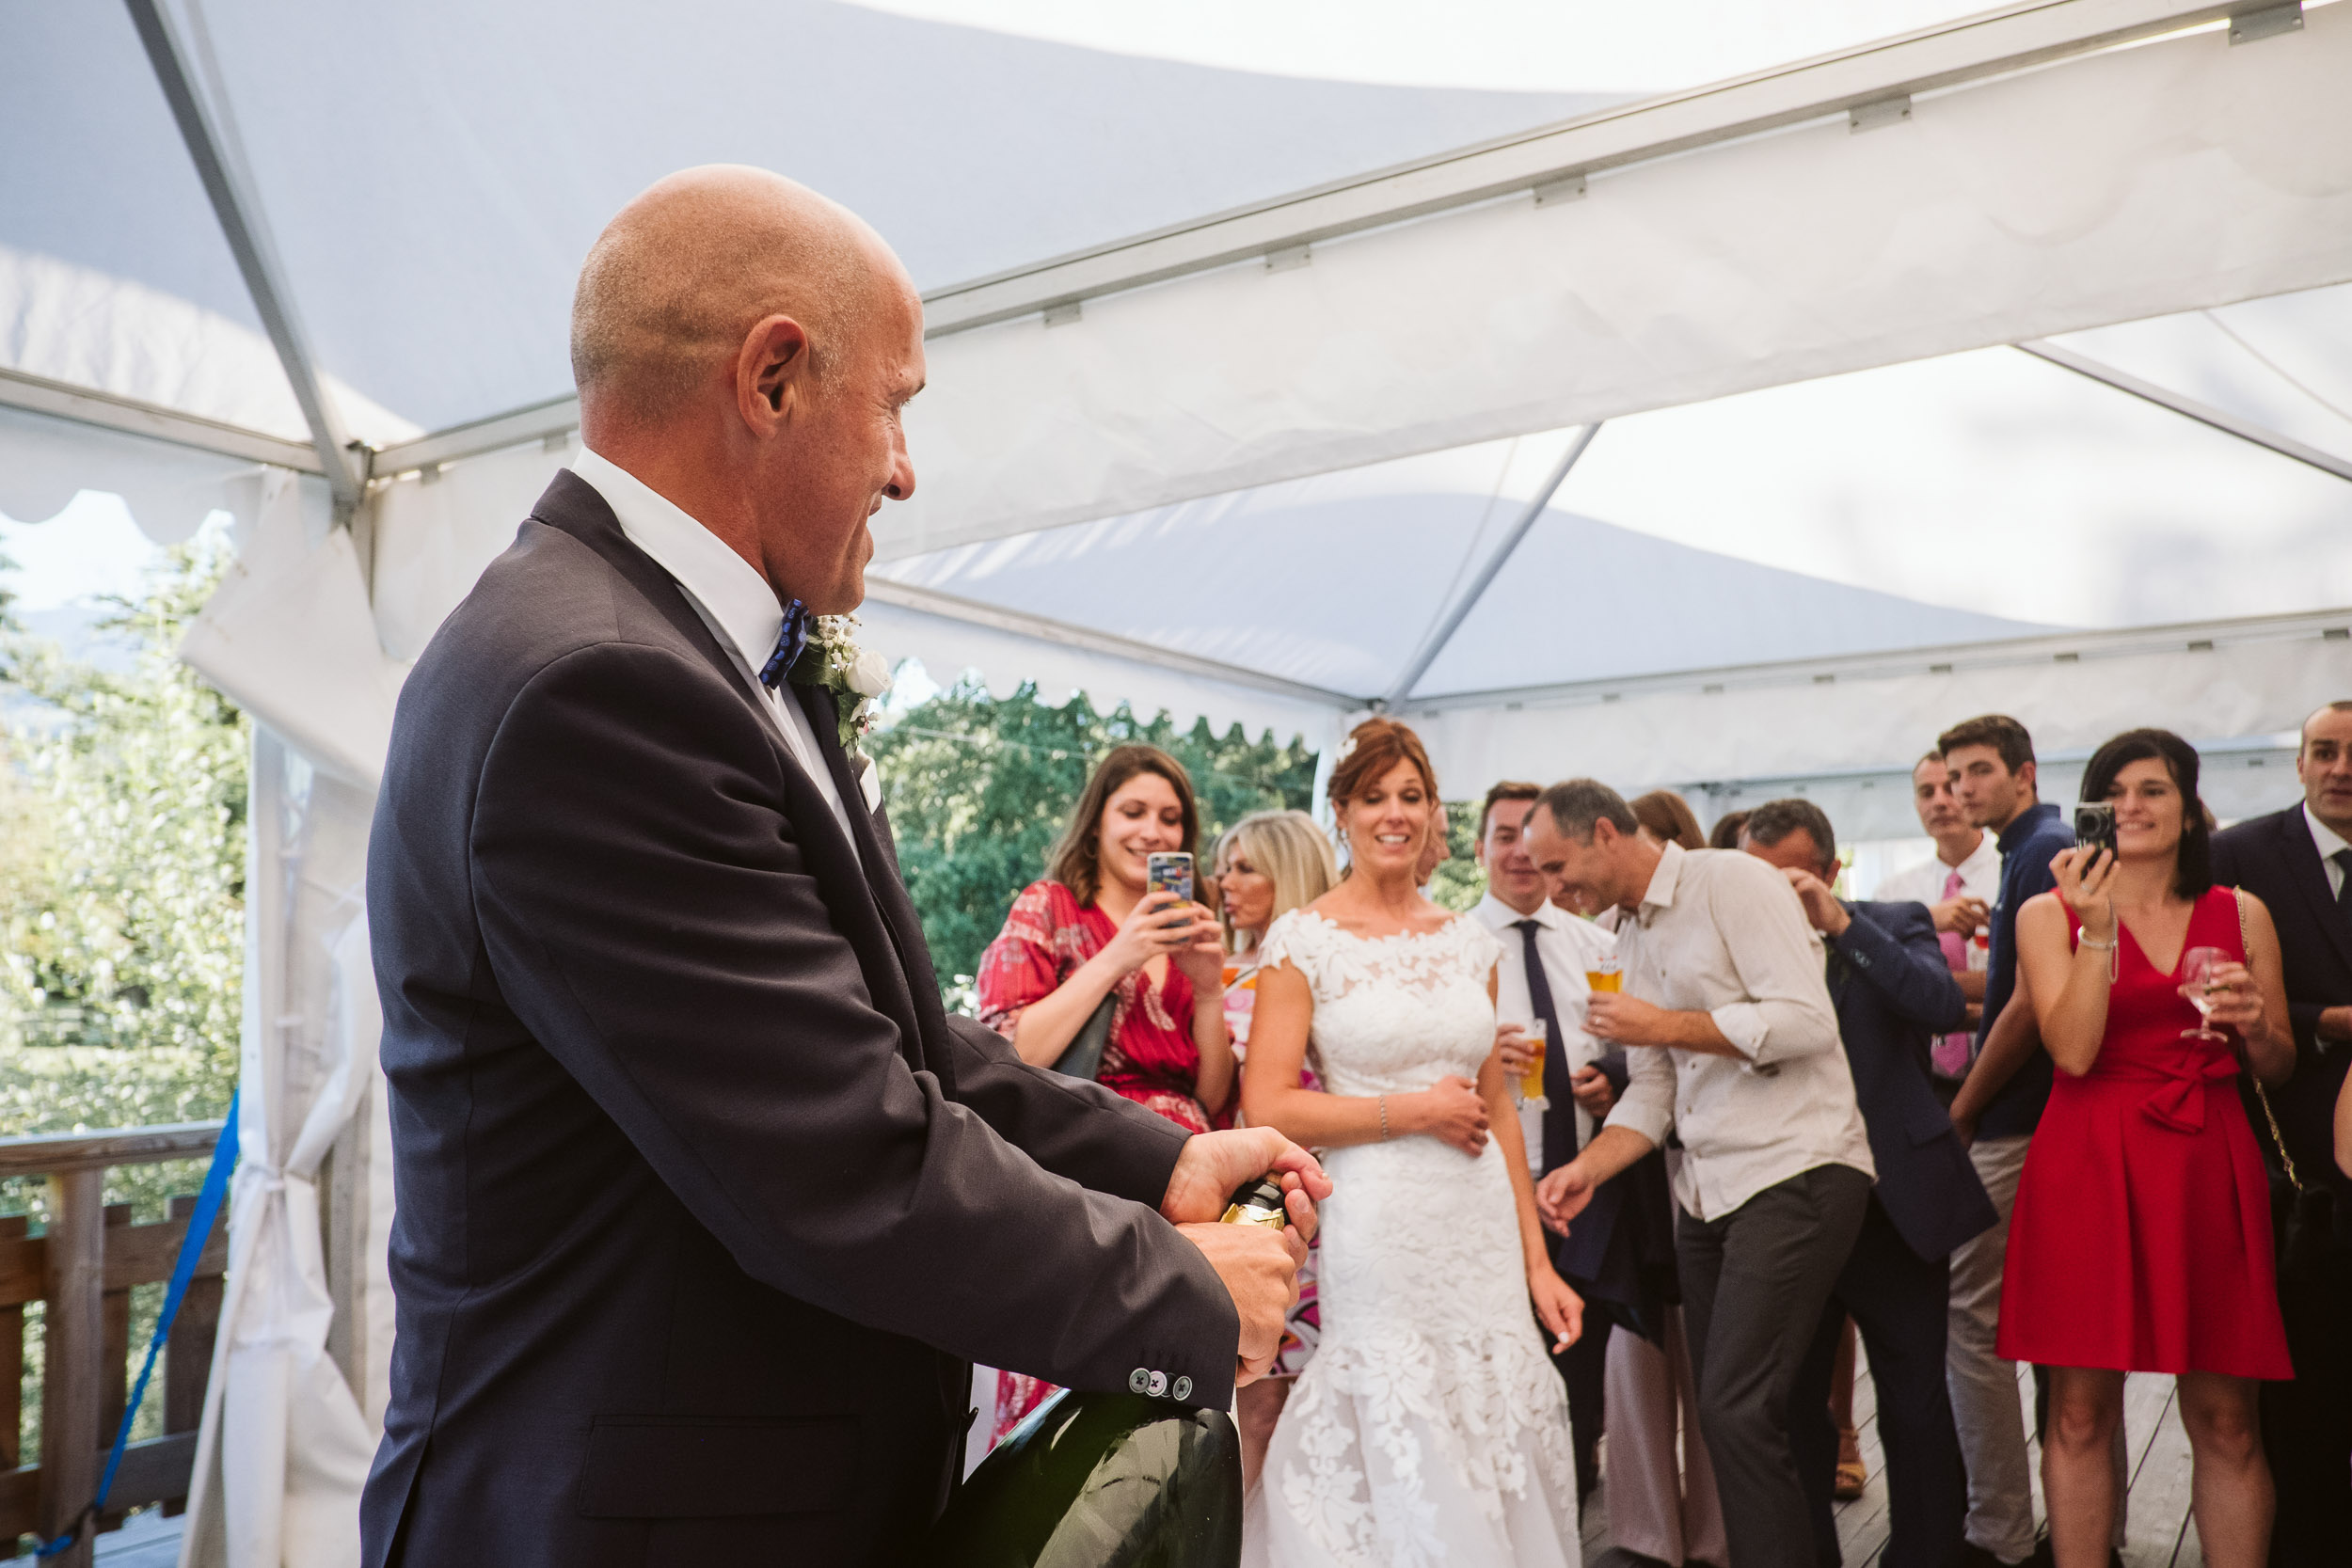 gerald-mattel-photographe-mariage-sallanches-10.jpg